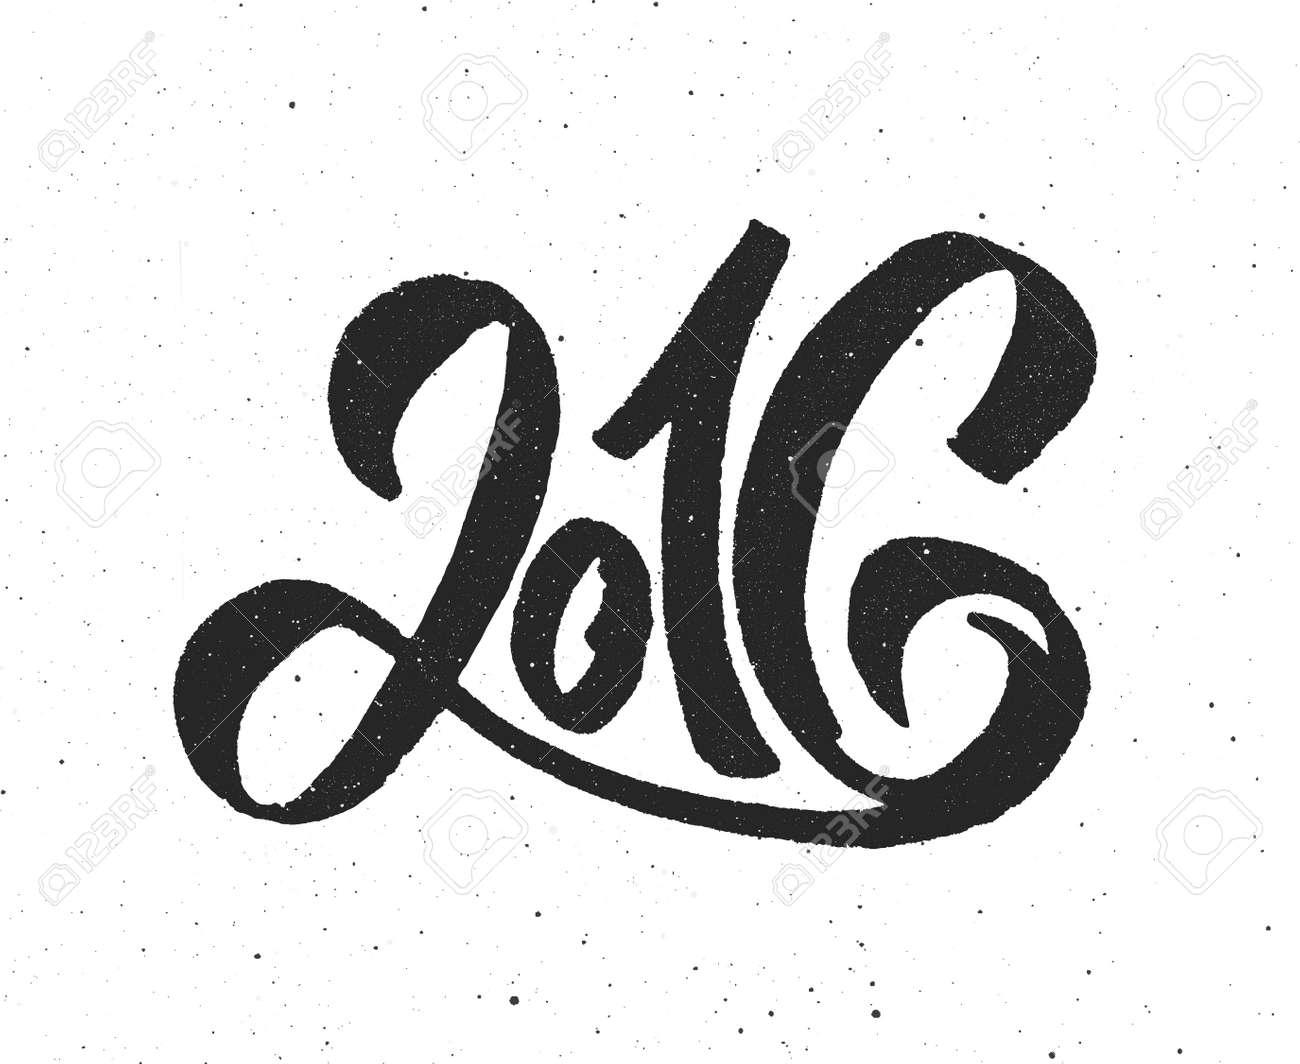 2016 New Year Handmade Greeting Card Design Chinese Calligraphy